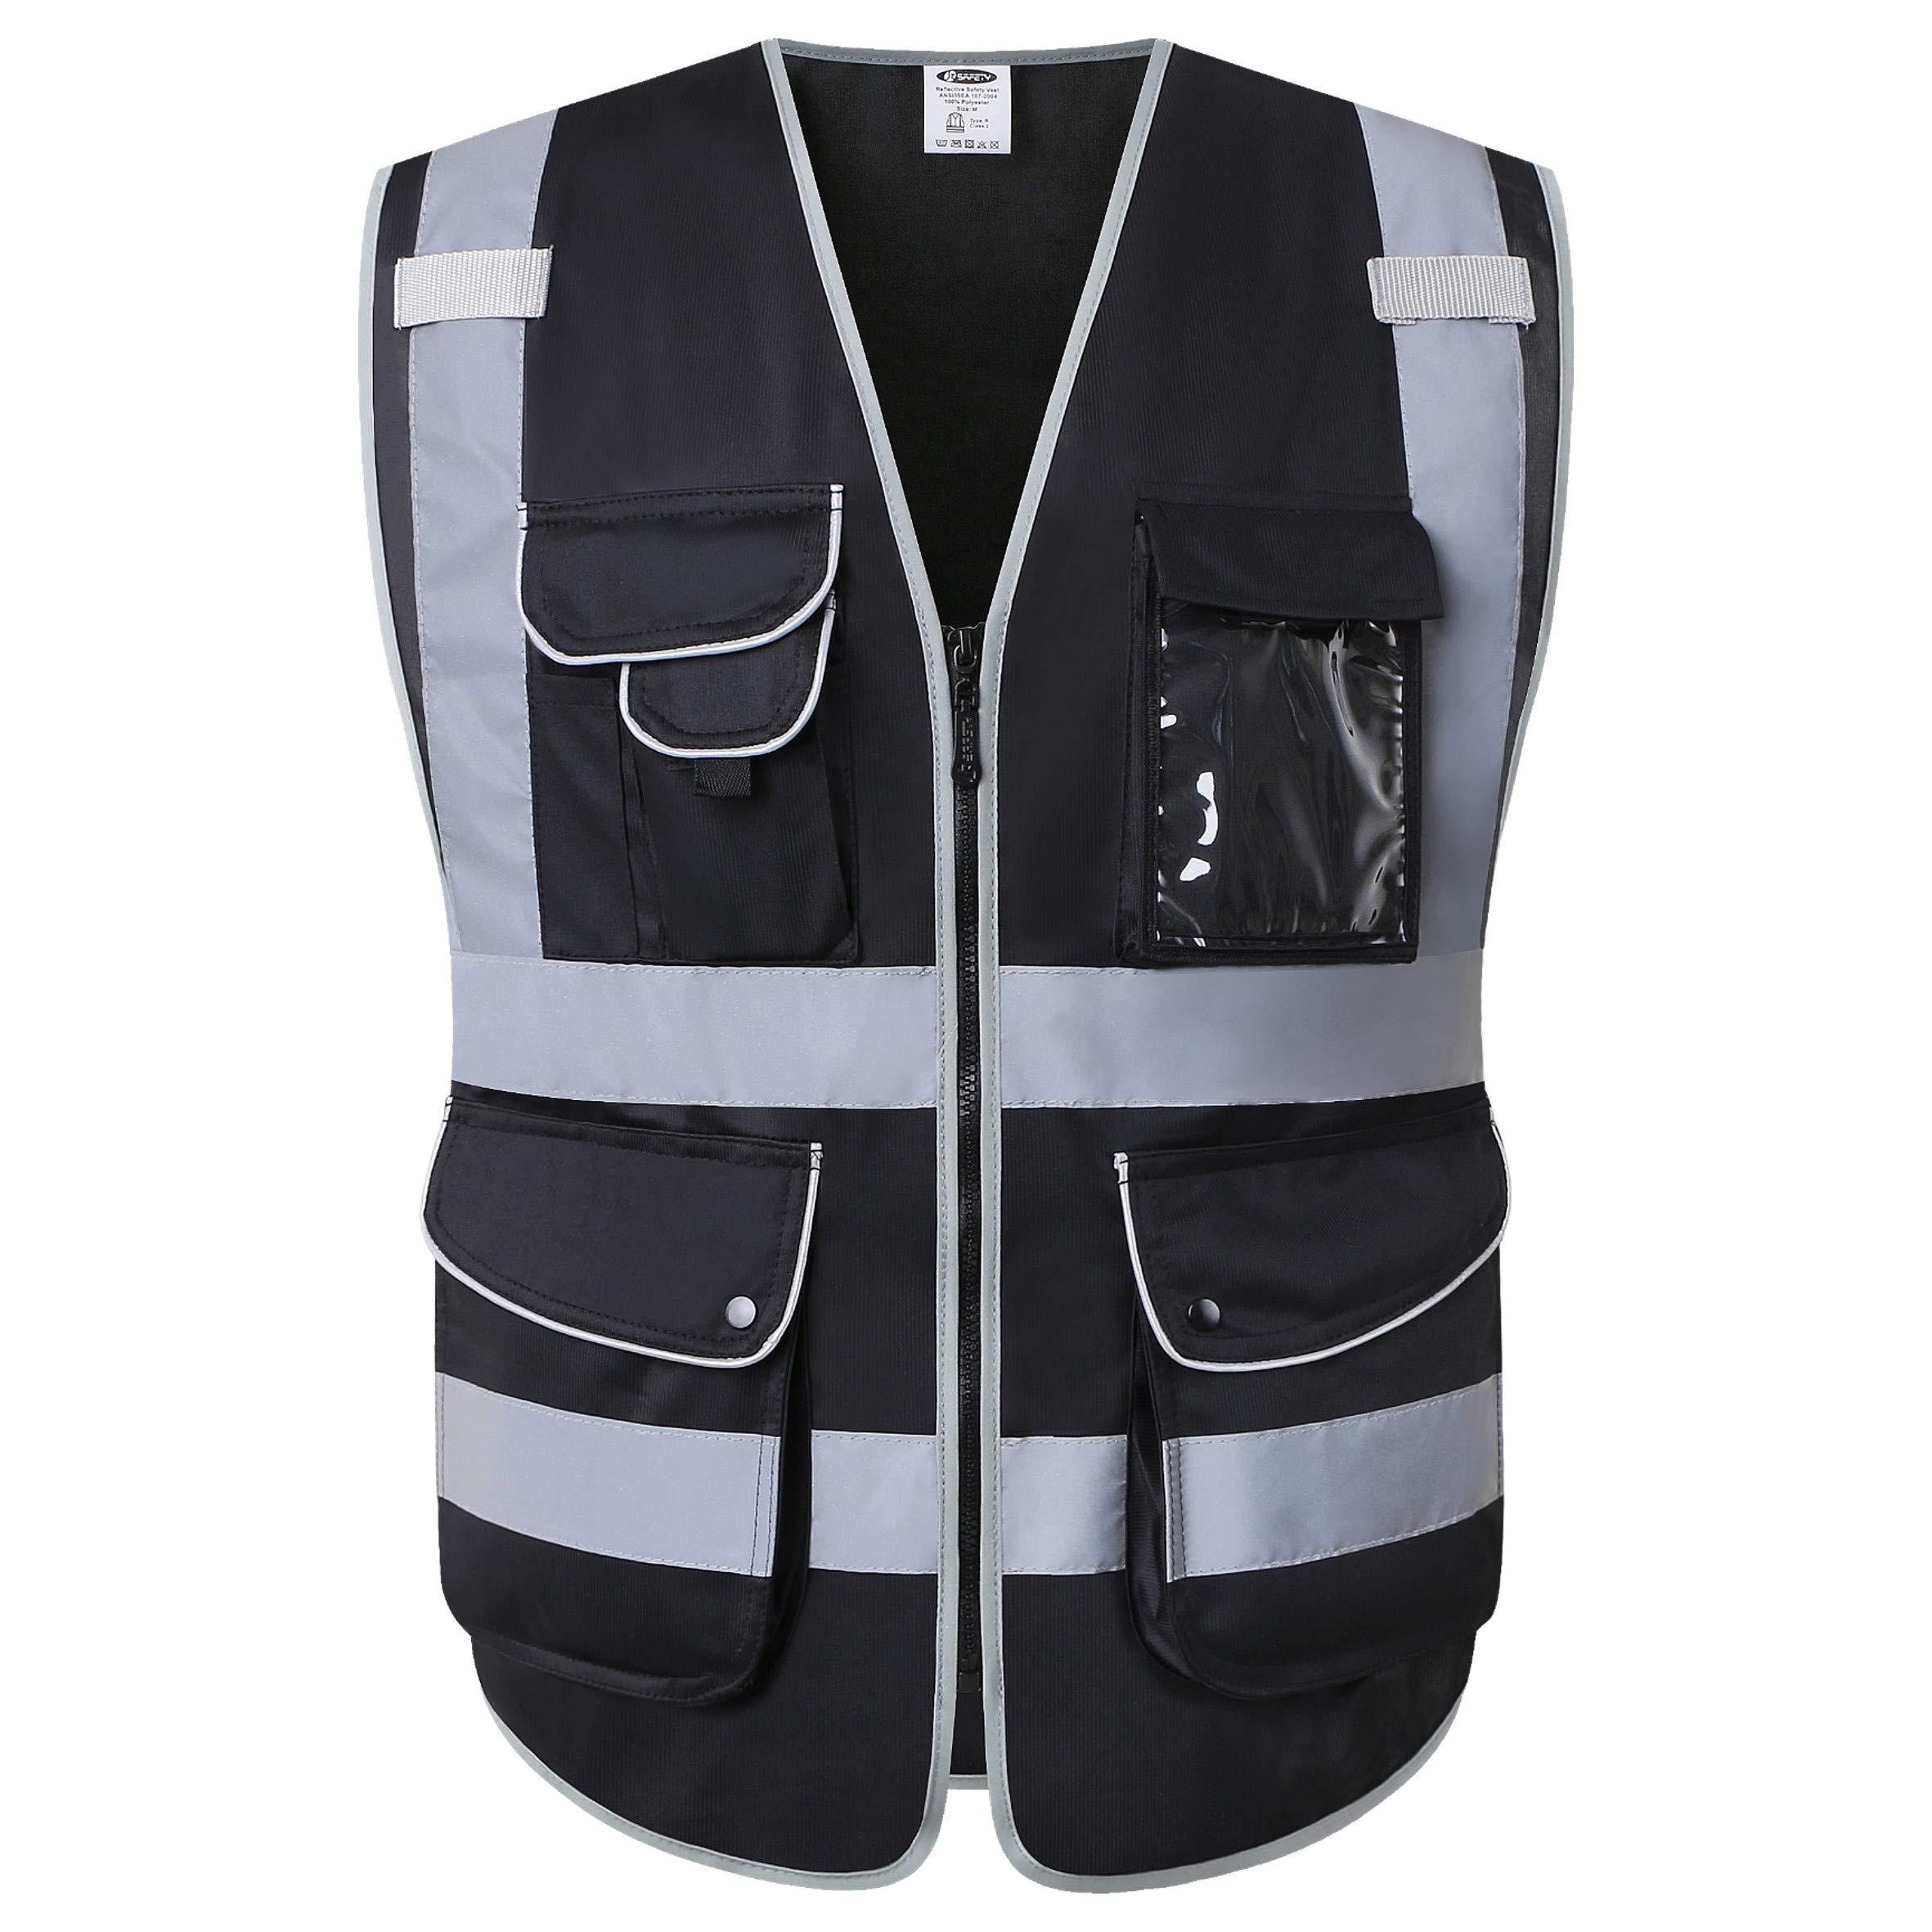 JKSafety 9 Multi-Functional Pockets Zipper Front Safety Vest With Reflective Strips Meet ANSI/ISEA Standards (Black, Large)